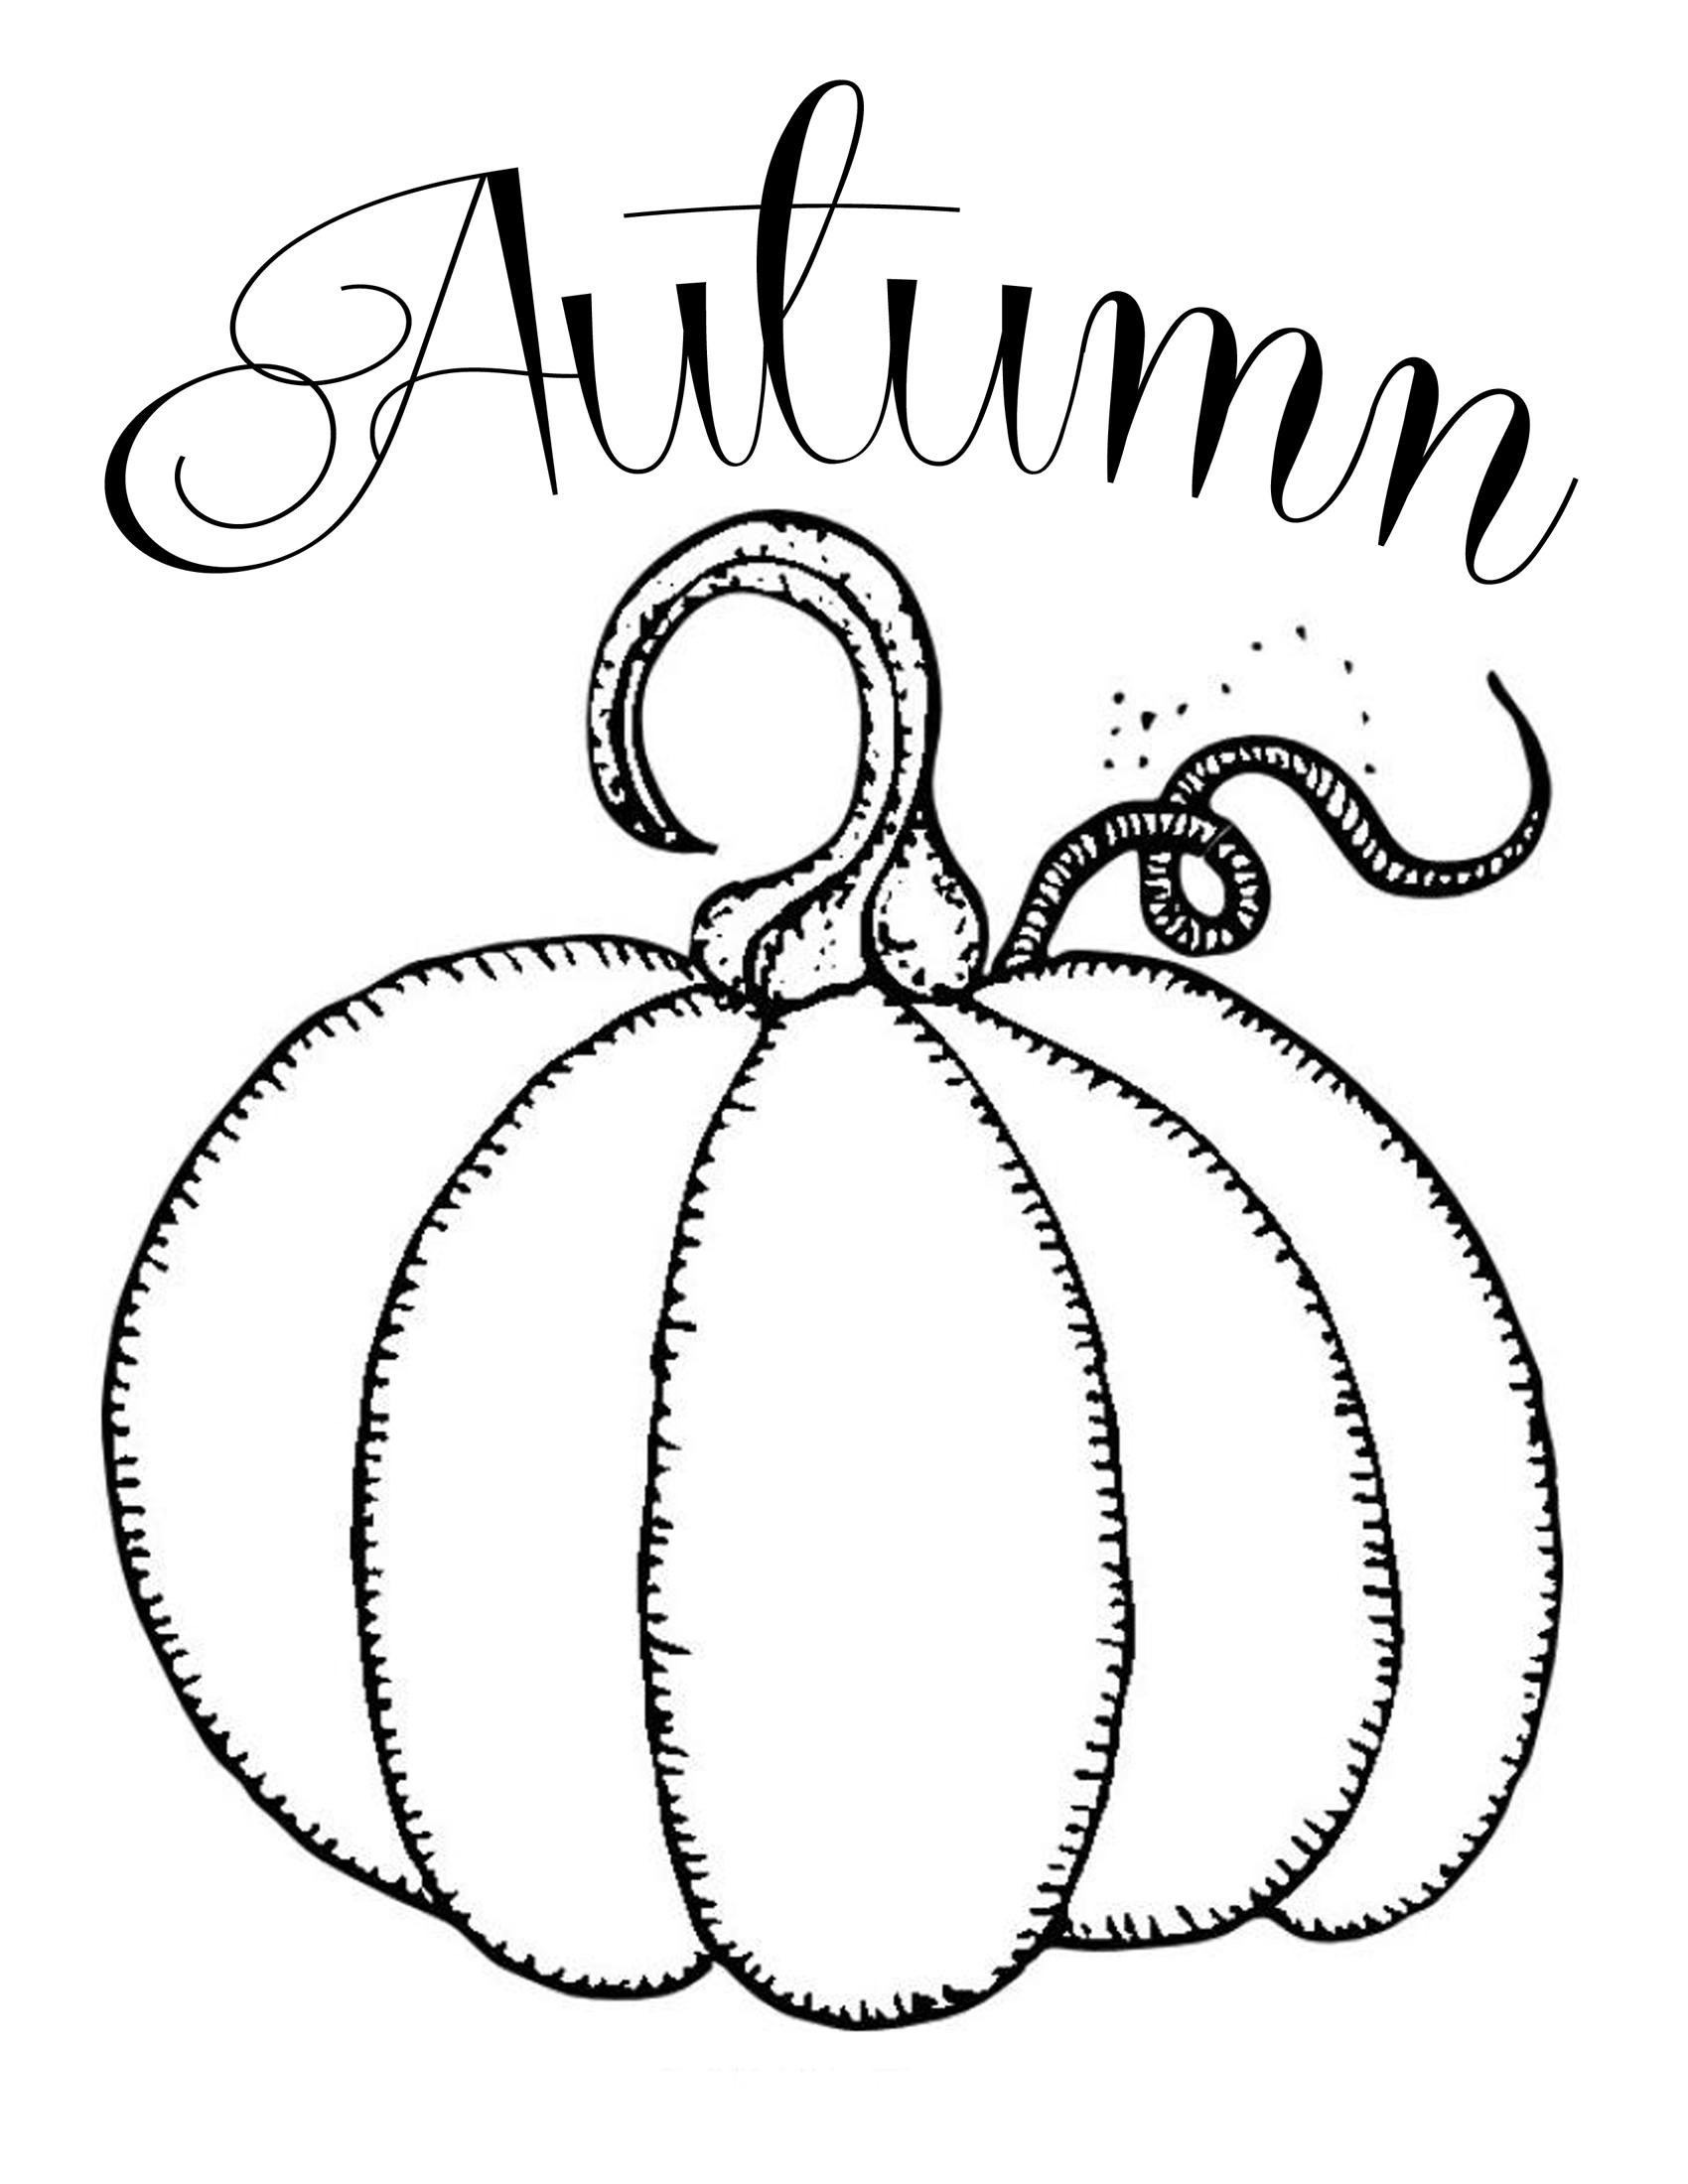 Pumpkin Drawing Template At Getdrawings